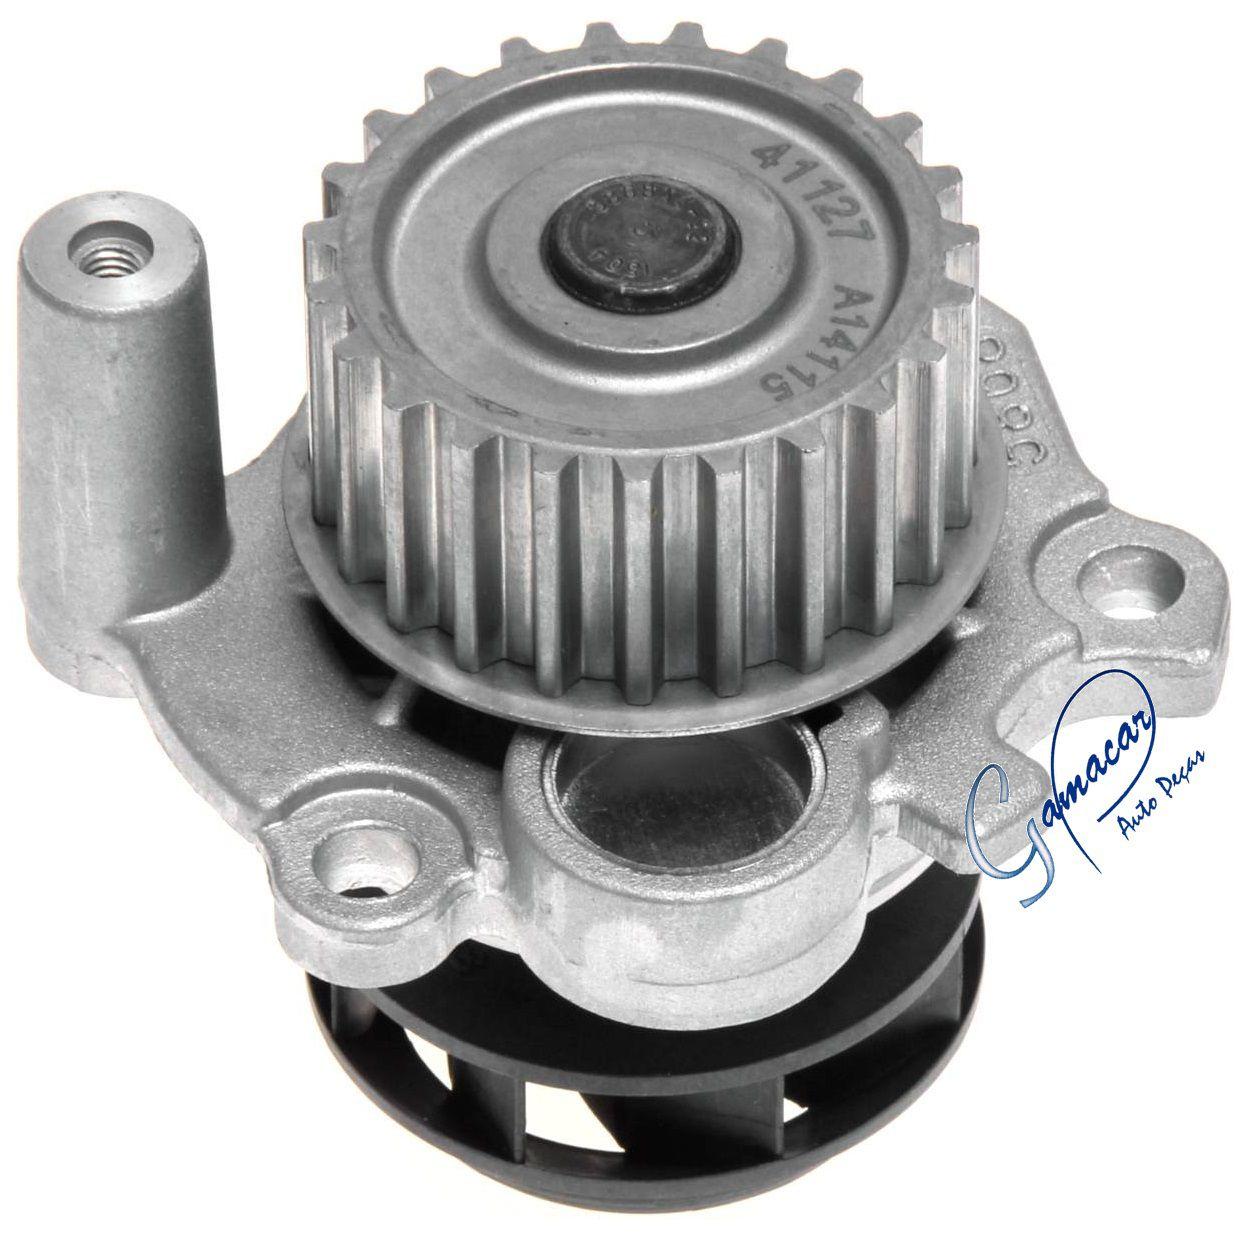 Bomba dAgua Audi A3 1.8 20v Aspirado / Turbo 1997 - 2006  VW Jetta 2.0 8v Flex Turbo  2011 - 2017